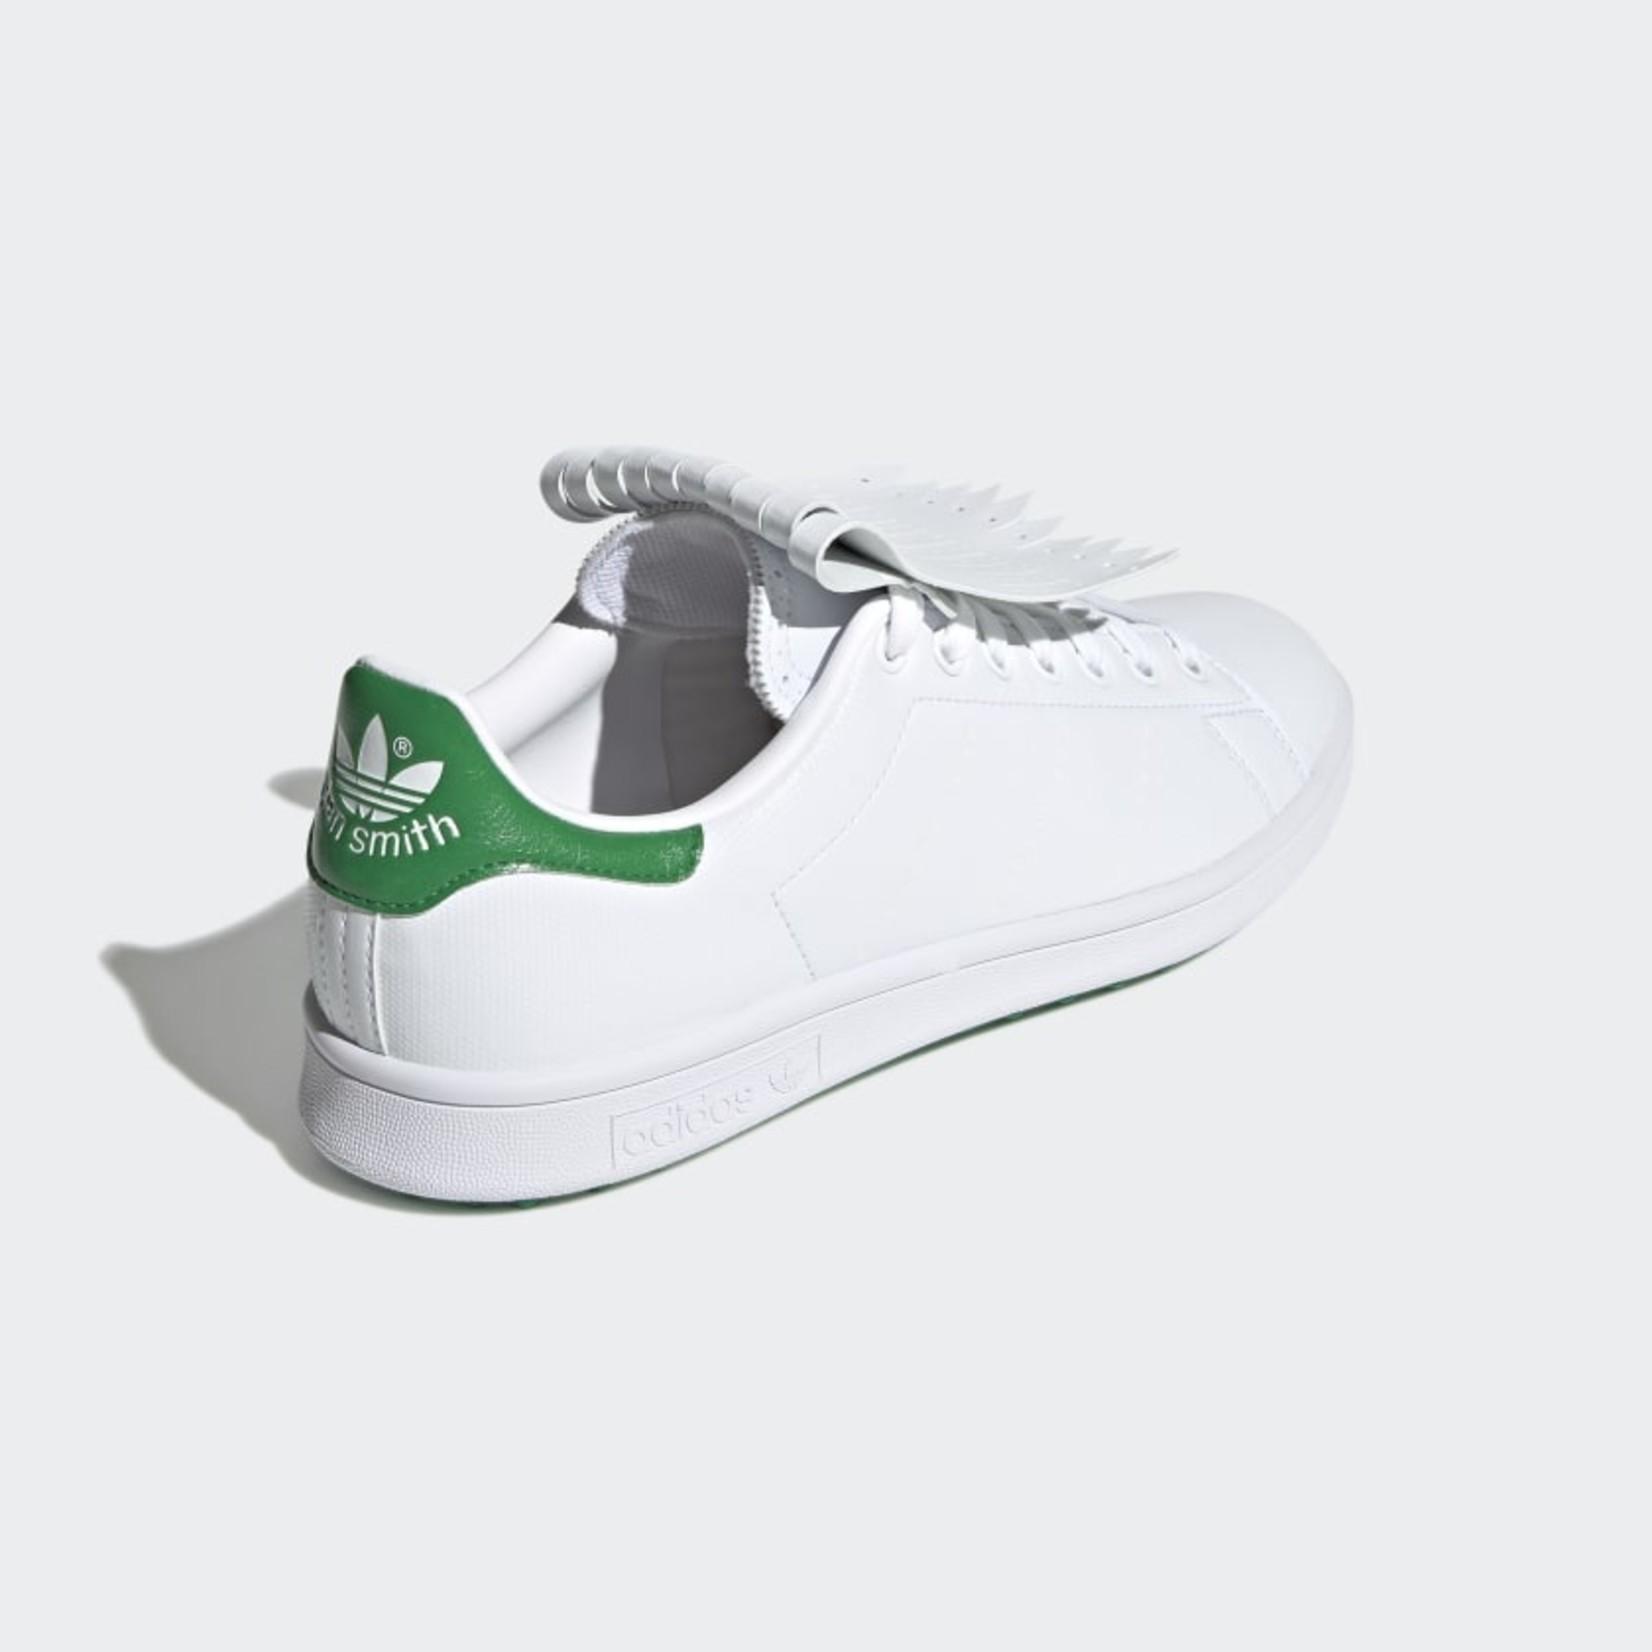 Adidas Stan Smith Primegreen - Special Edition